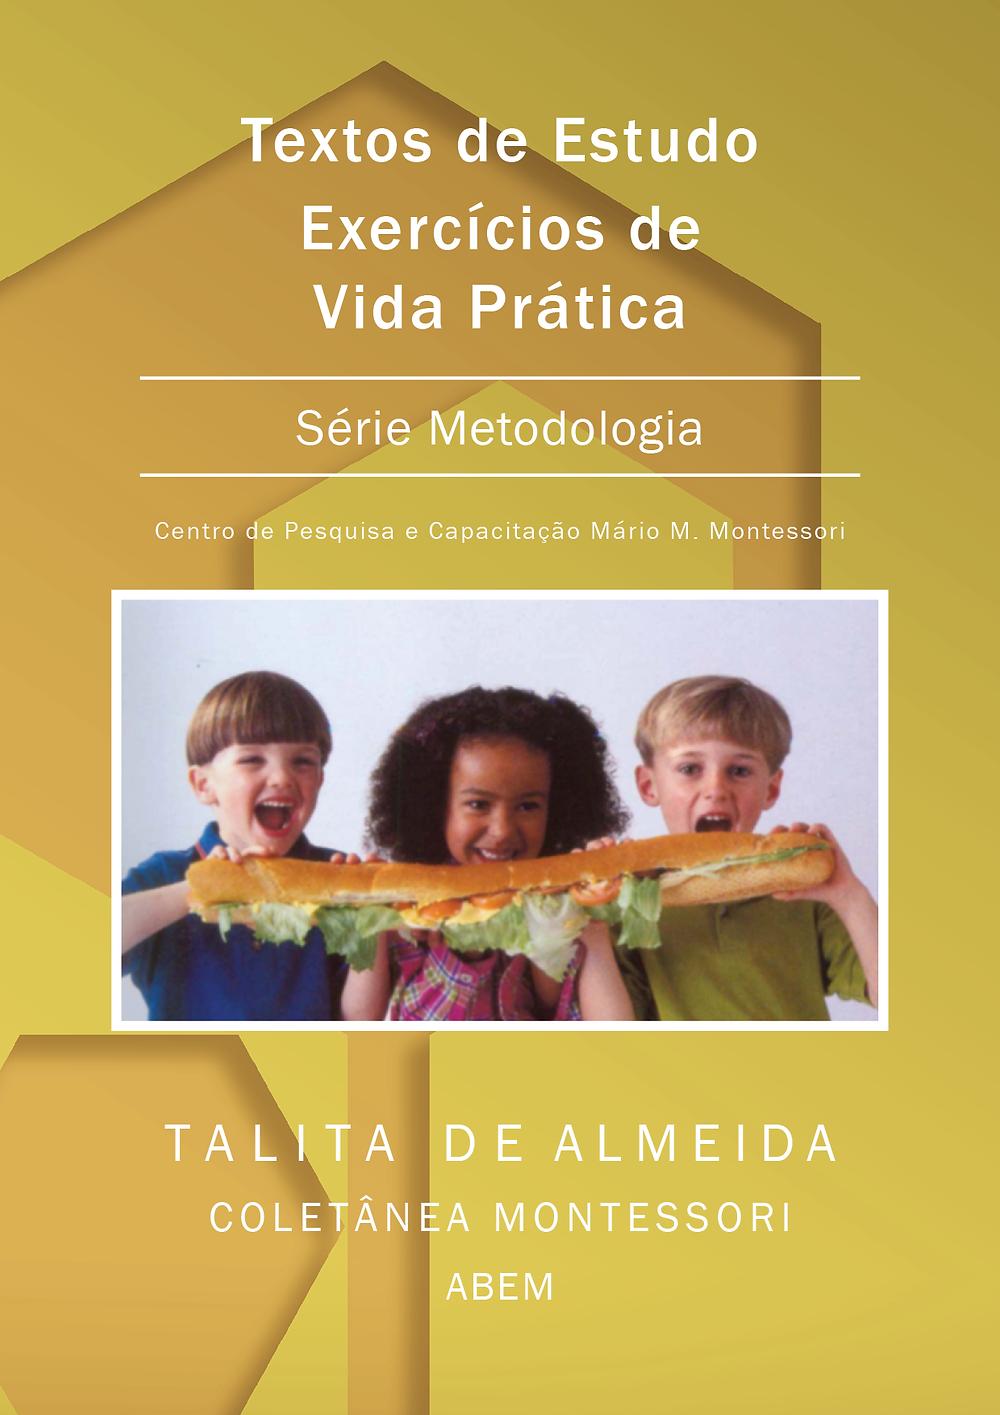 Textos Montessori